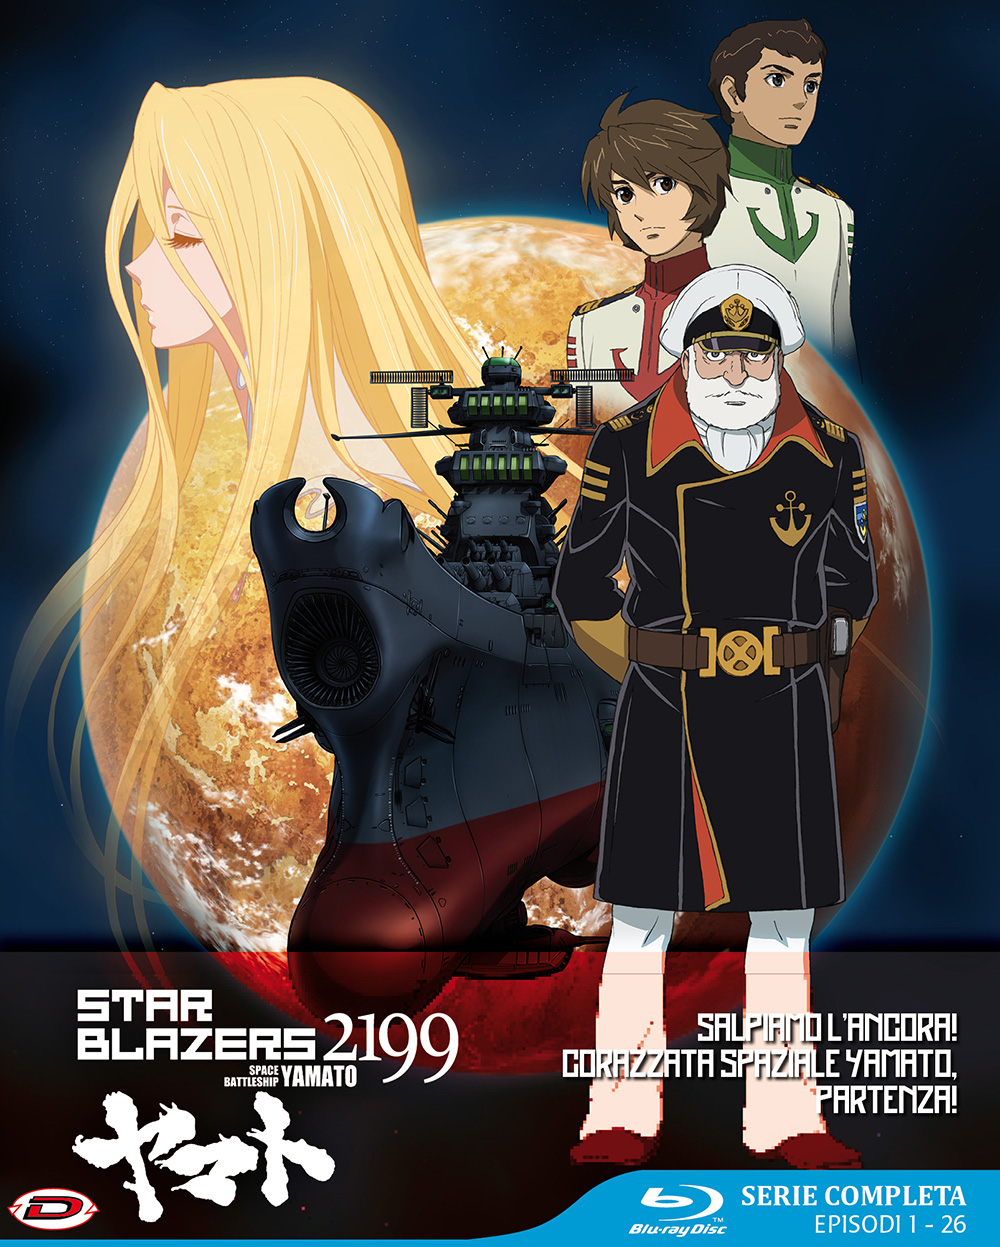 COF.STAR BLAZERS 2199 - THE COMPLETE SERIES (EPS 01-26) (4 BLU-R